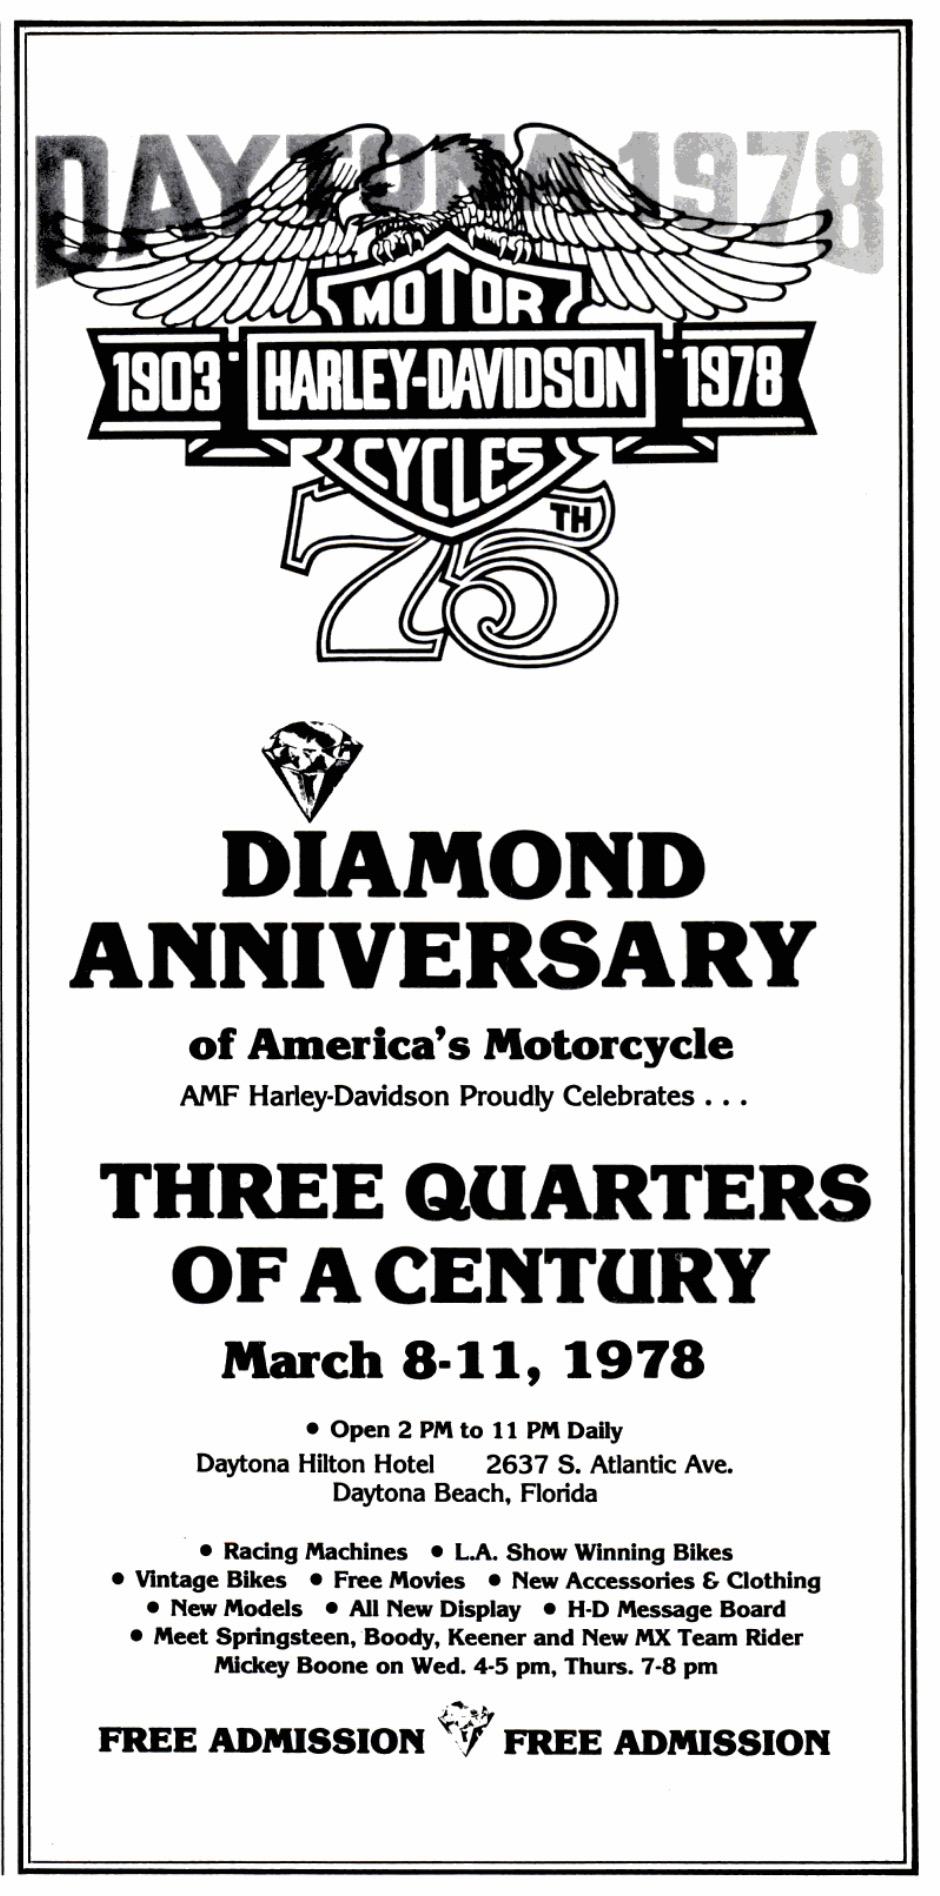 Actos celebración 75 aniversario en Daytona